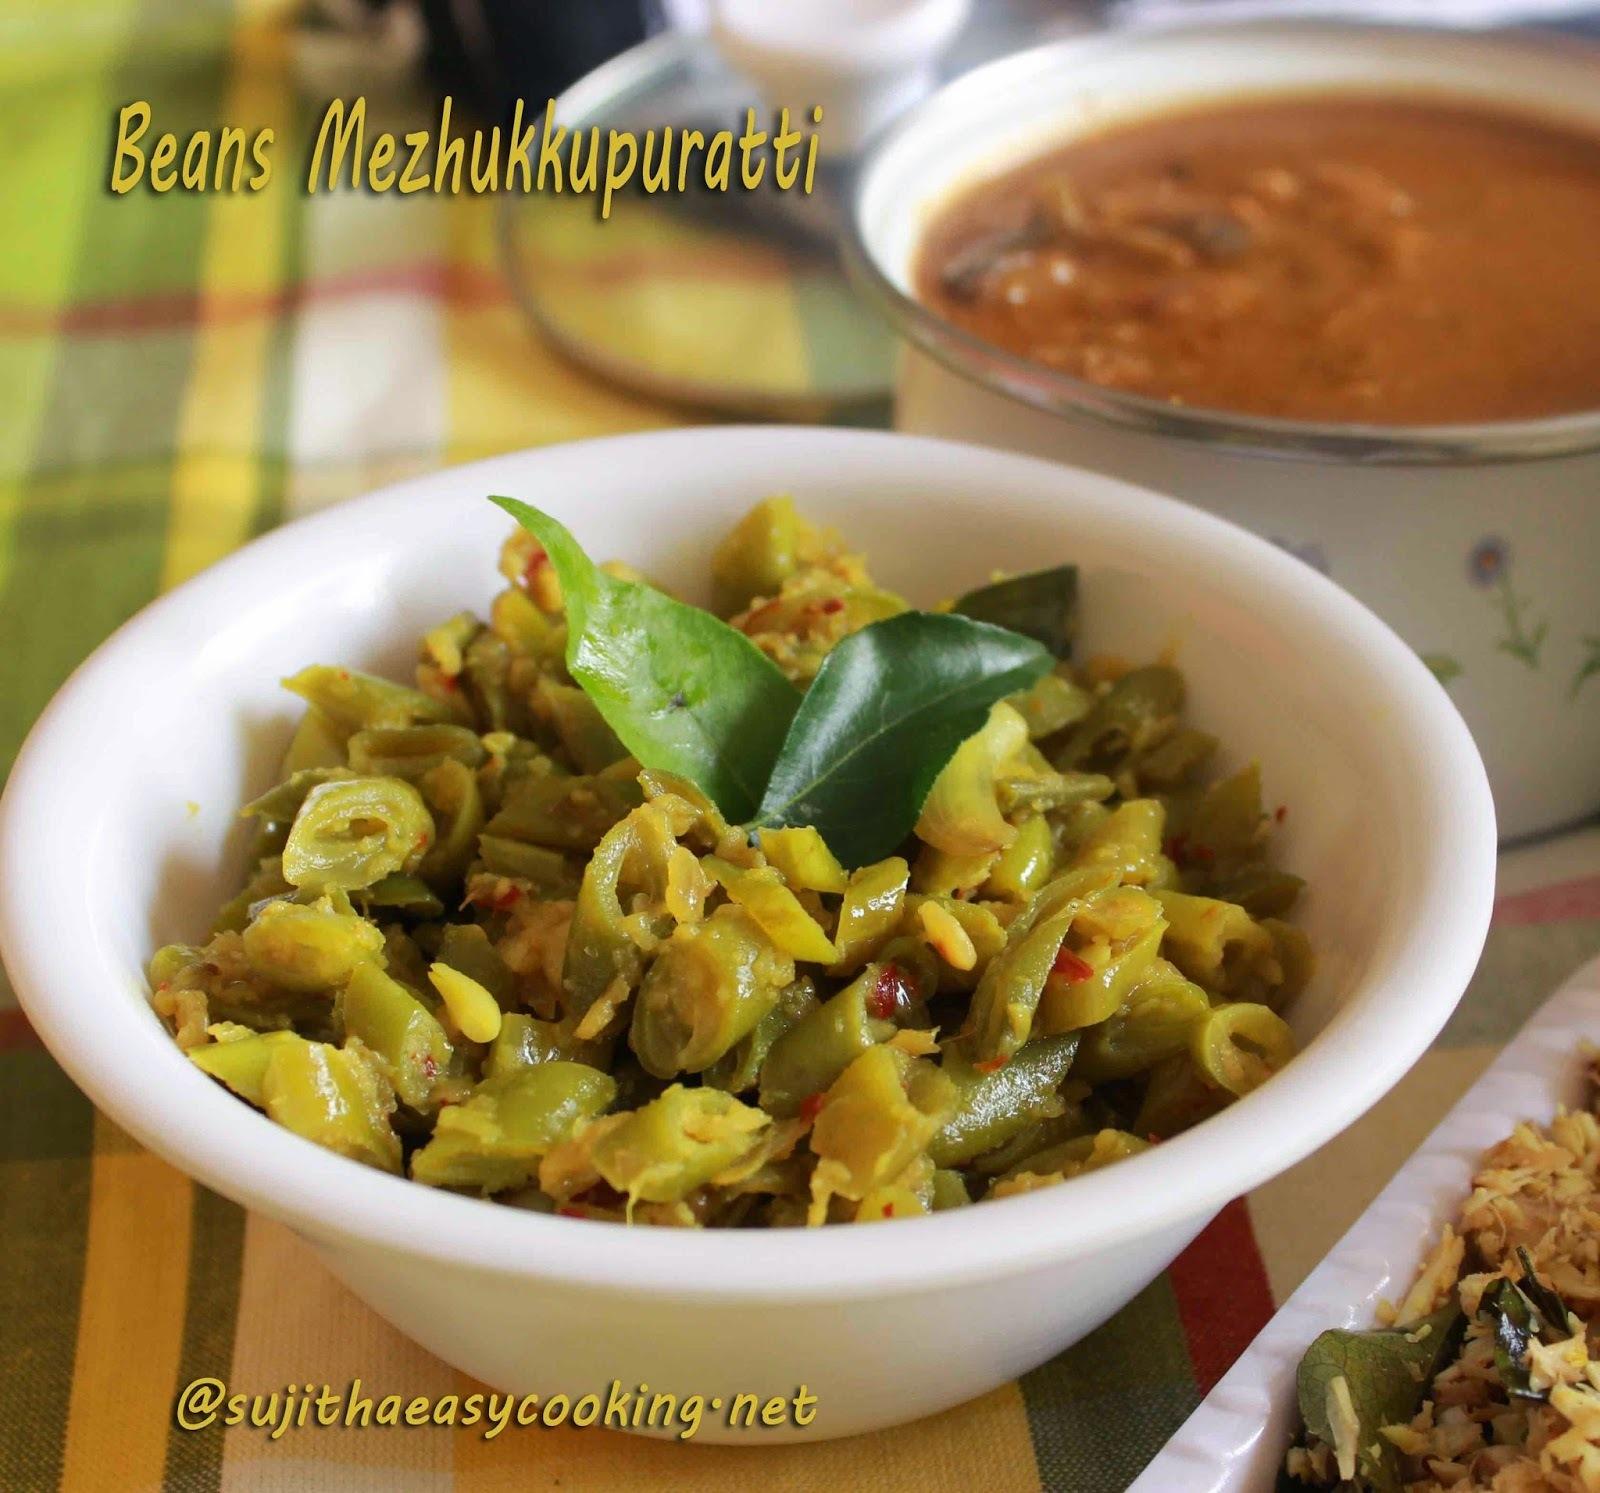 Beans Mezhukkupuratti/Stir fried beans in Kerala style